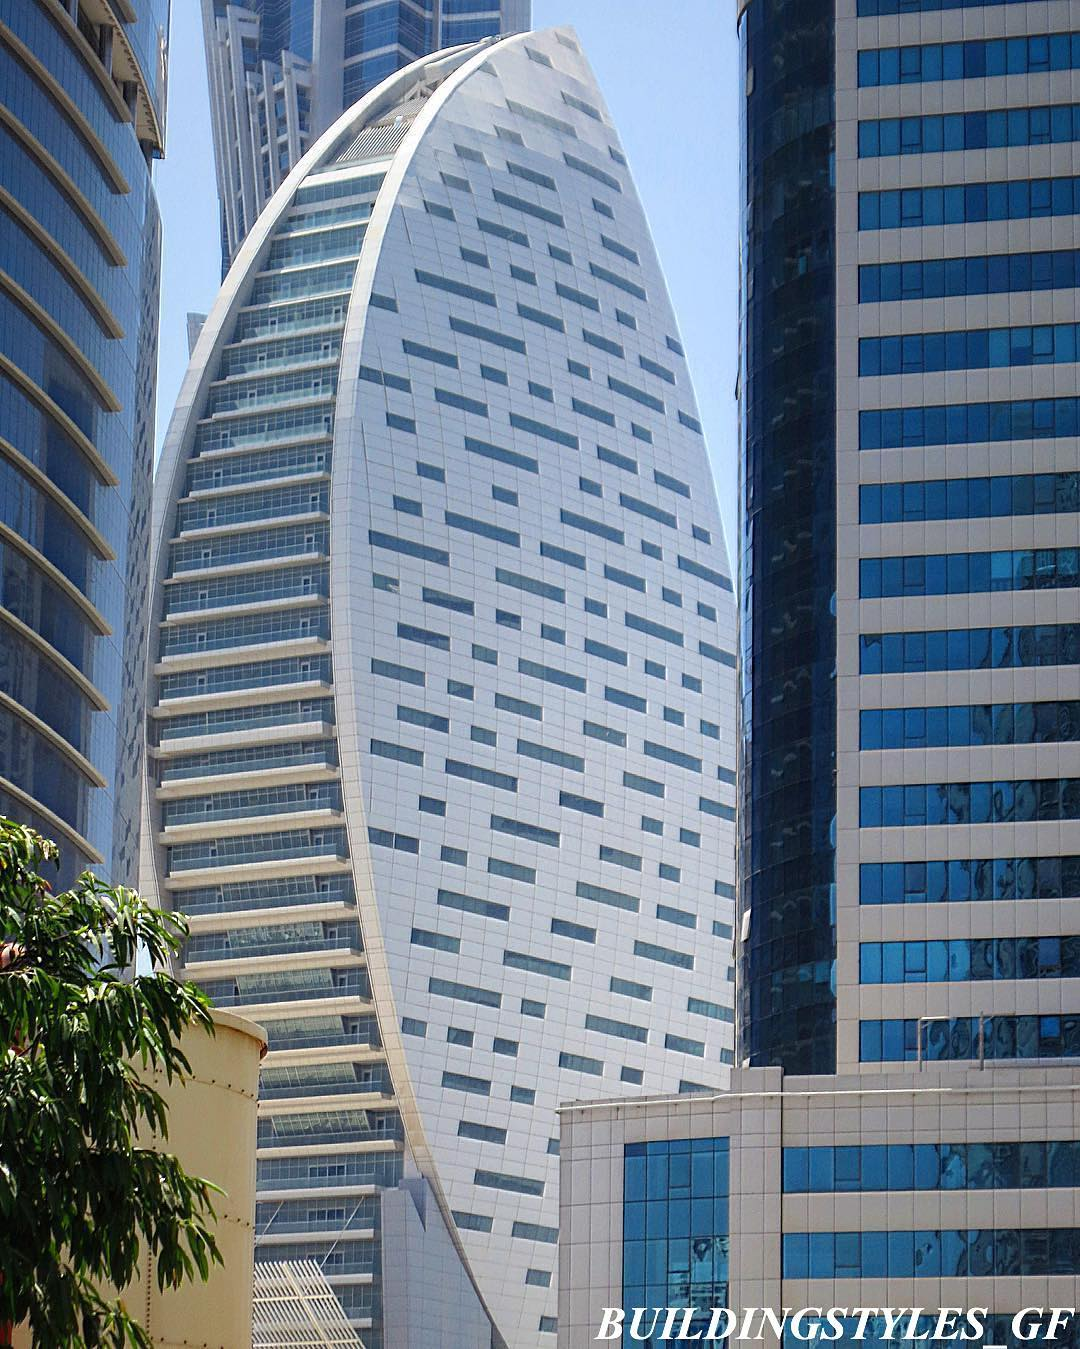 imagenes-de-edificios-modernos1054